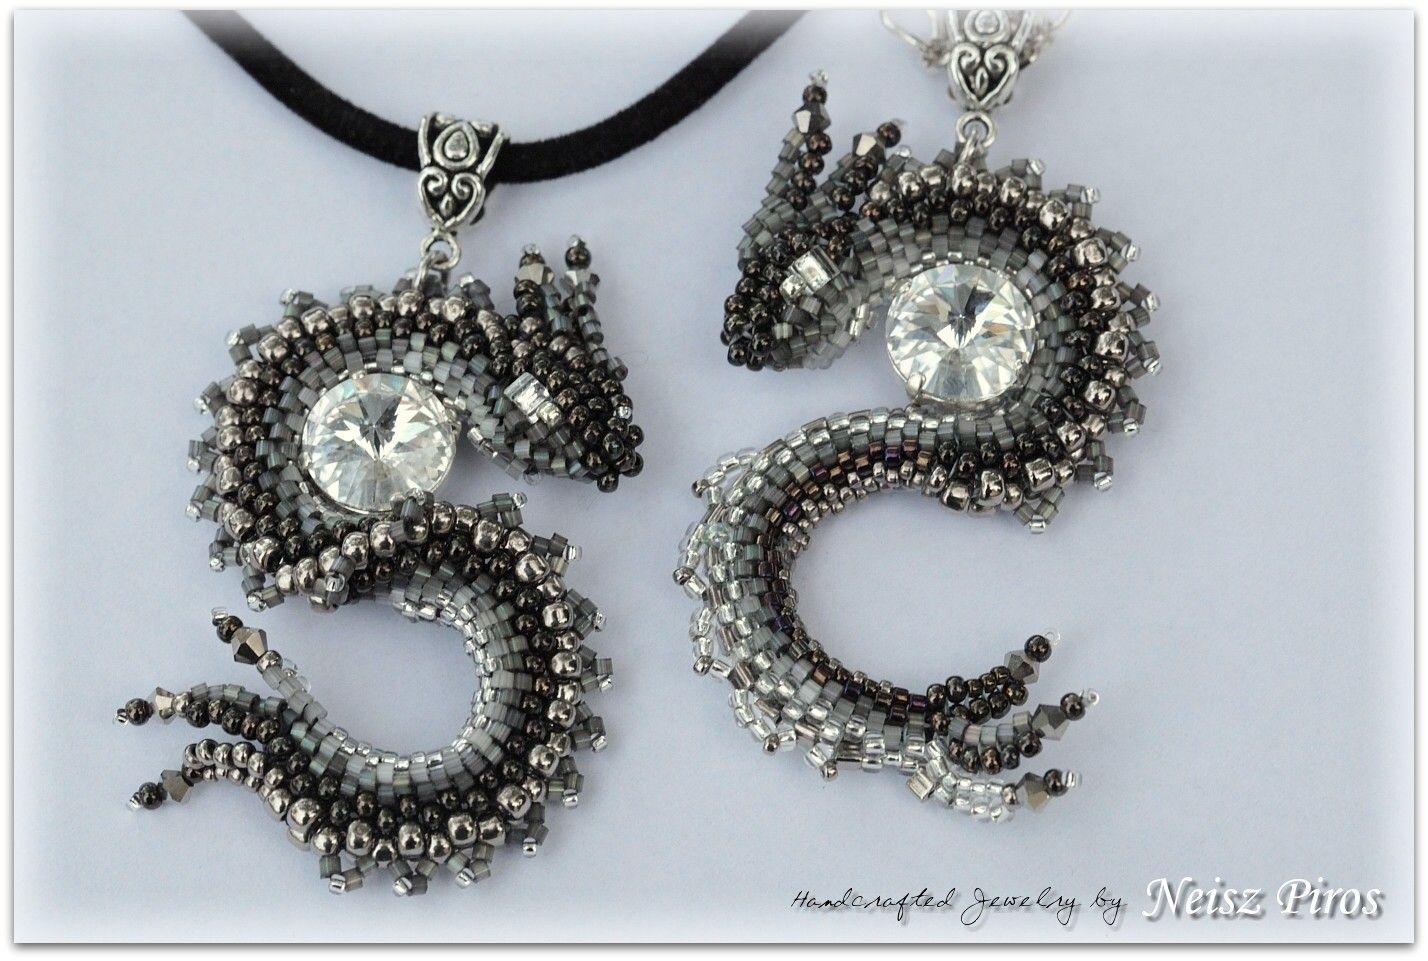 Instead of a bead use a rivoli: http://rrkra.deviantart.com/art/S-Dragon-Tutorial-263218162